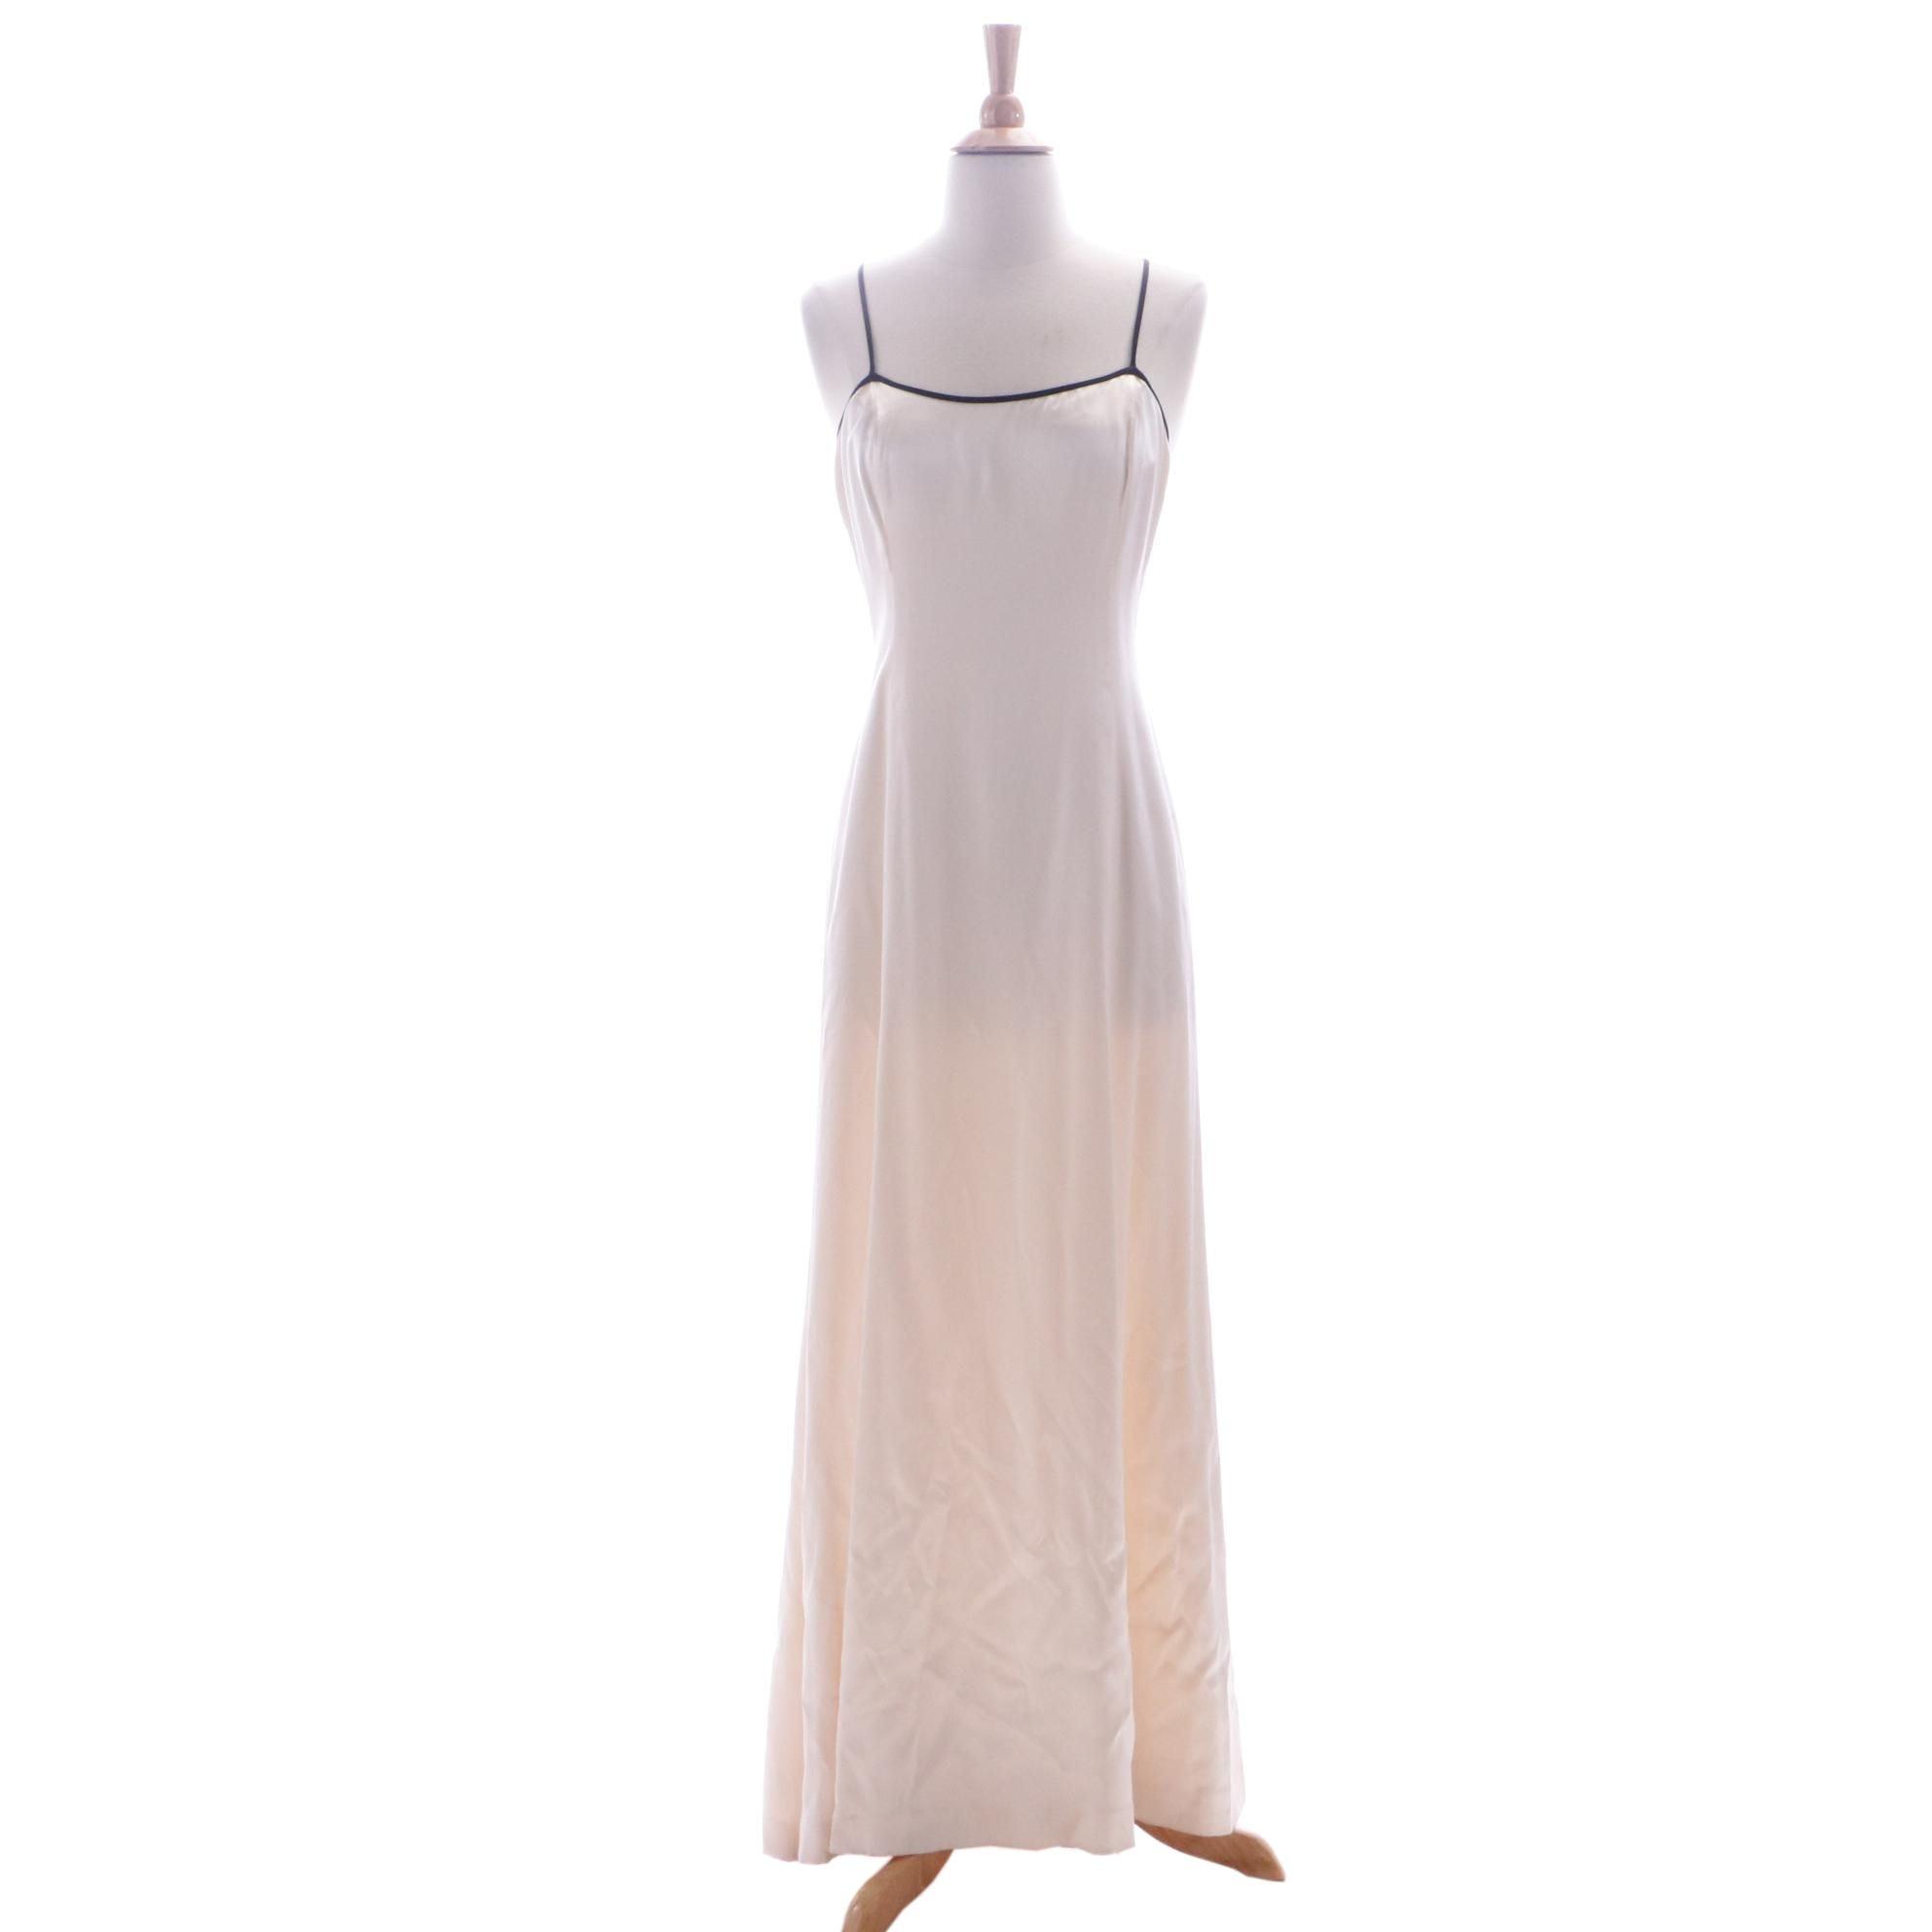 Circa 1990s Chanel Silk Slip Dress